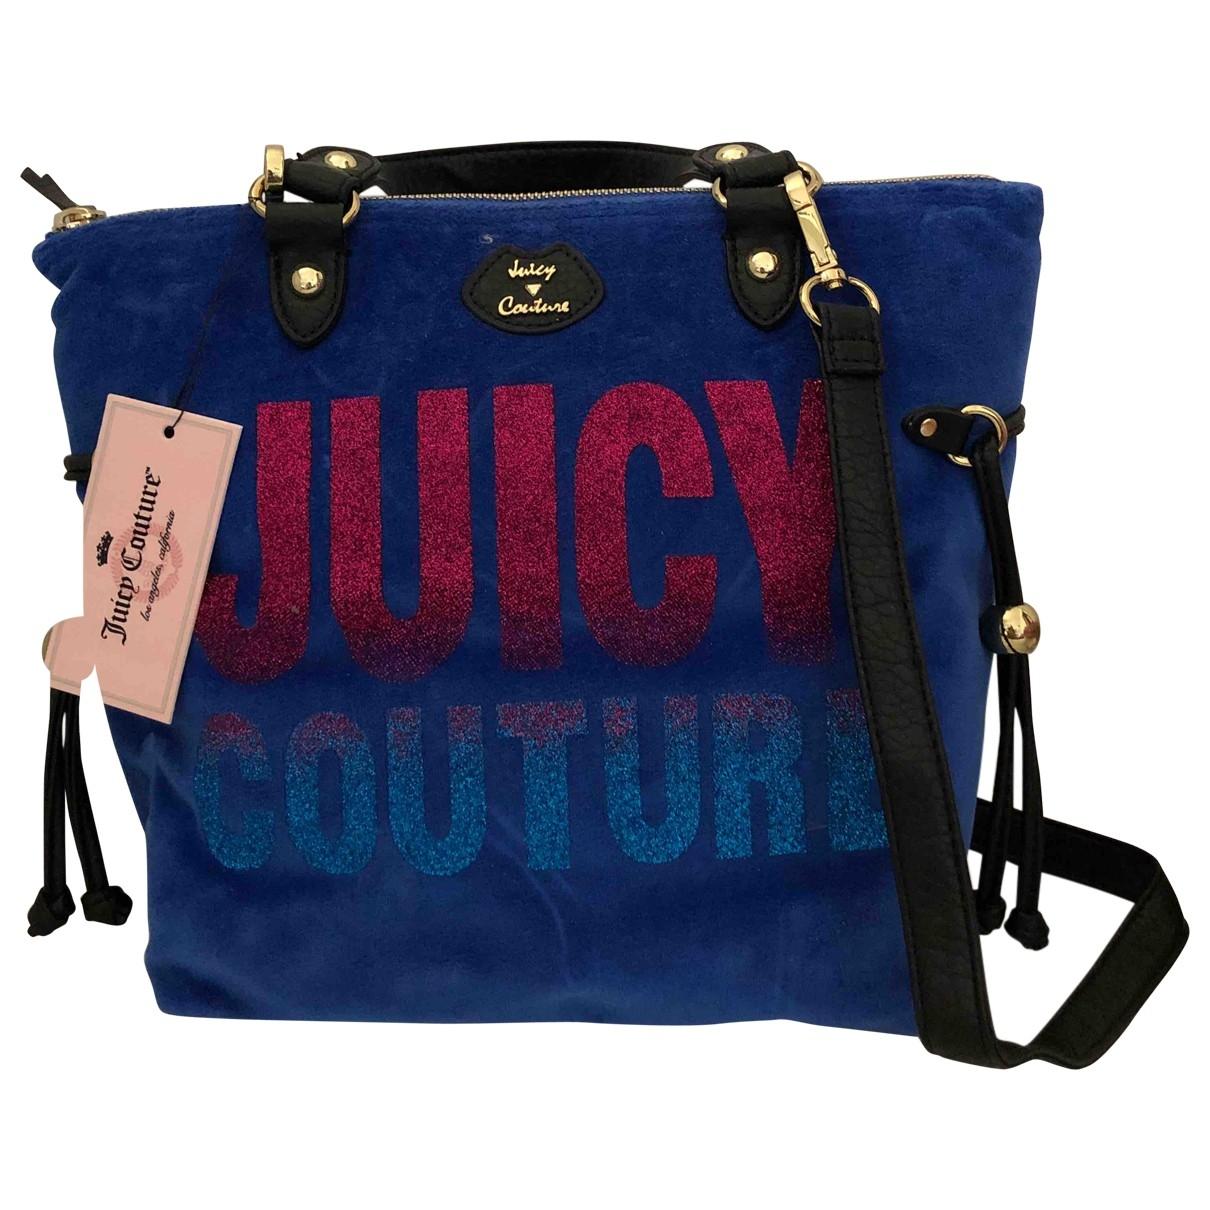 Juicy Couture \N Blue Velvet handbag for Women \N